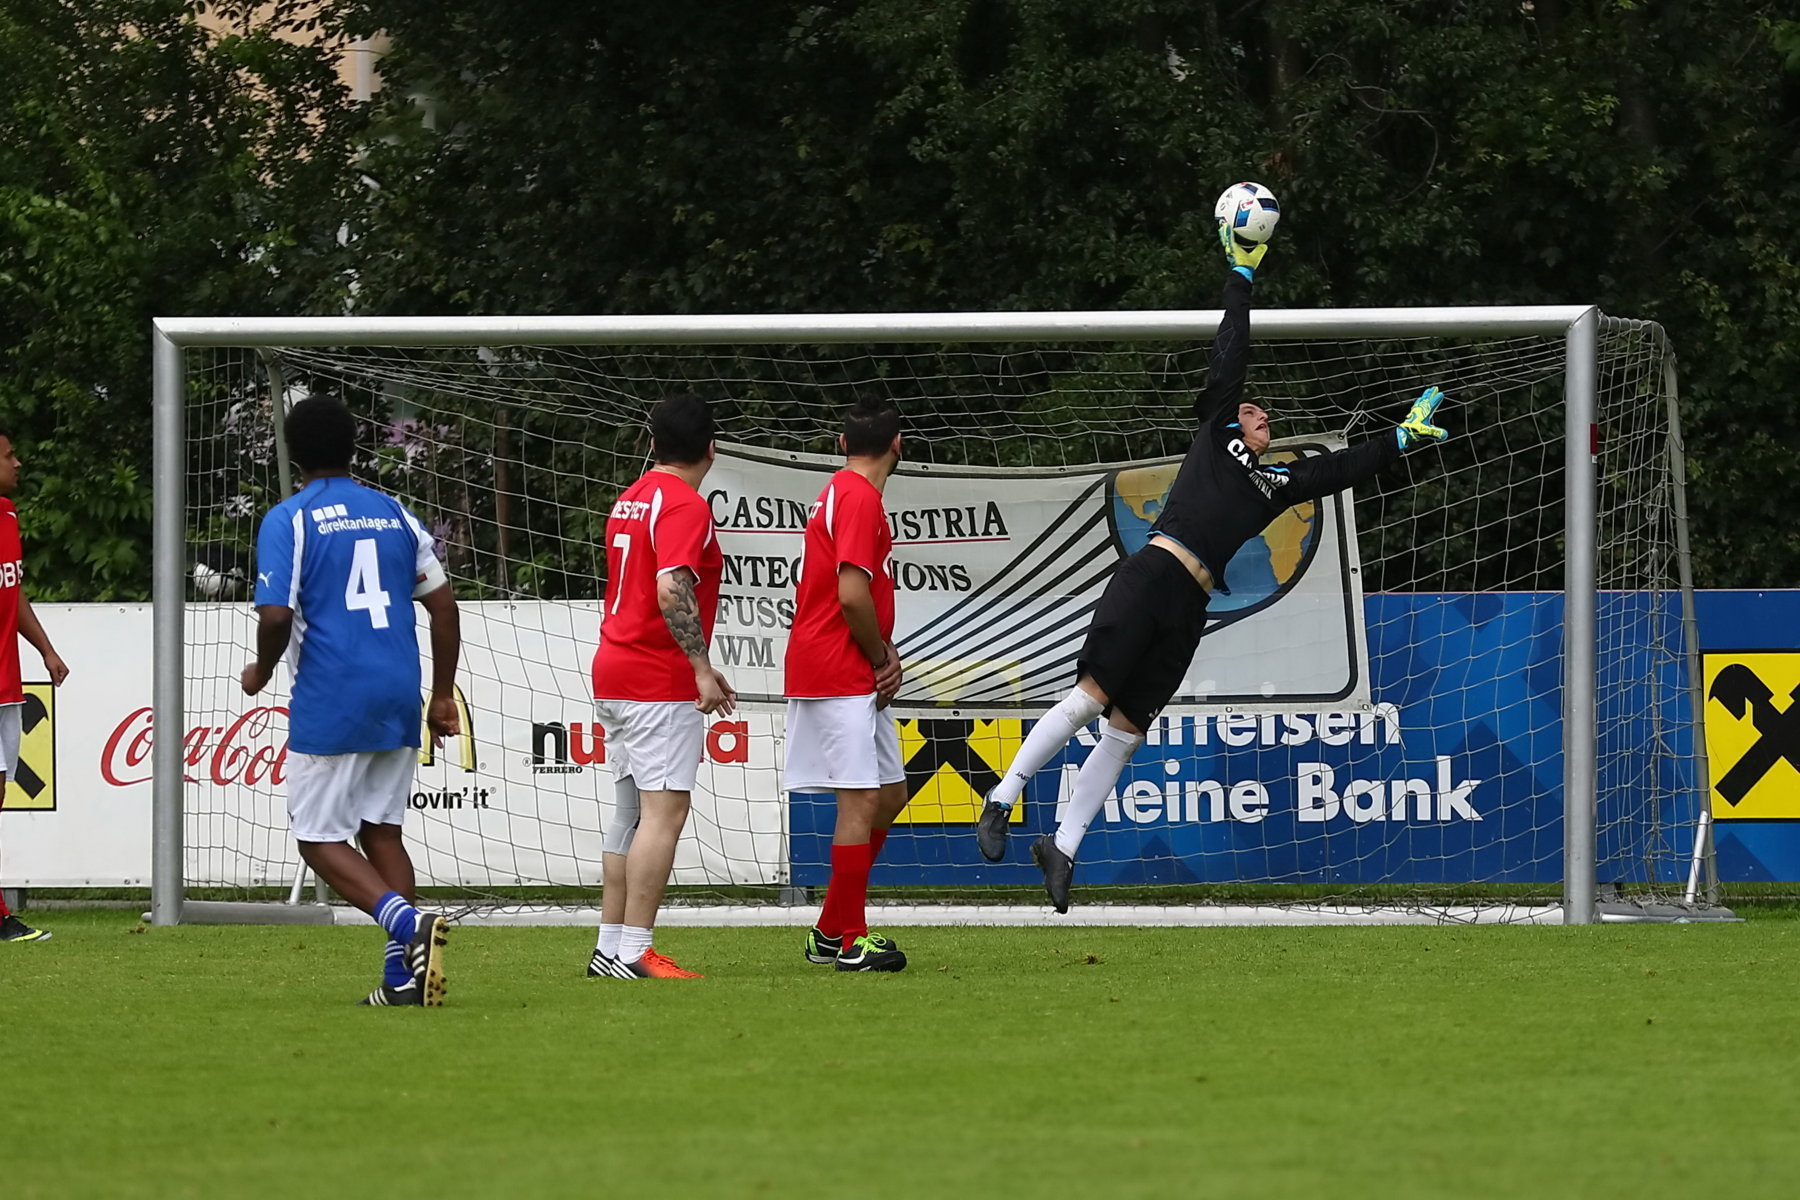 FMT Linz 2016 (2)